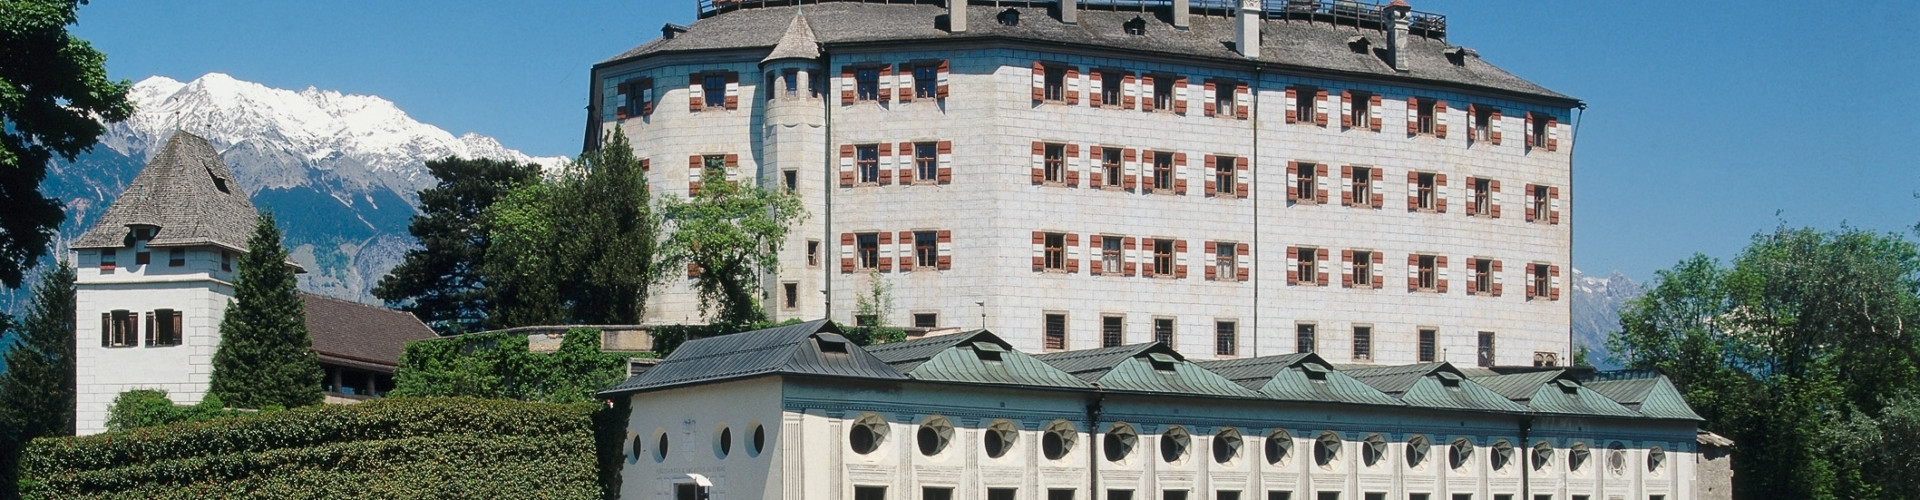 Ambras Palace Innsbruck © KHM-Museumsverband